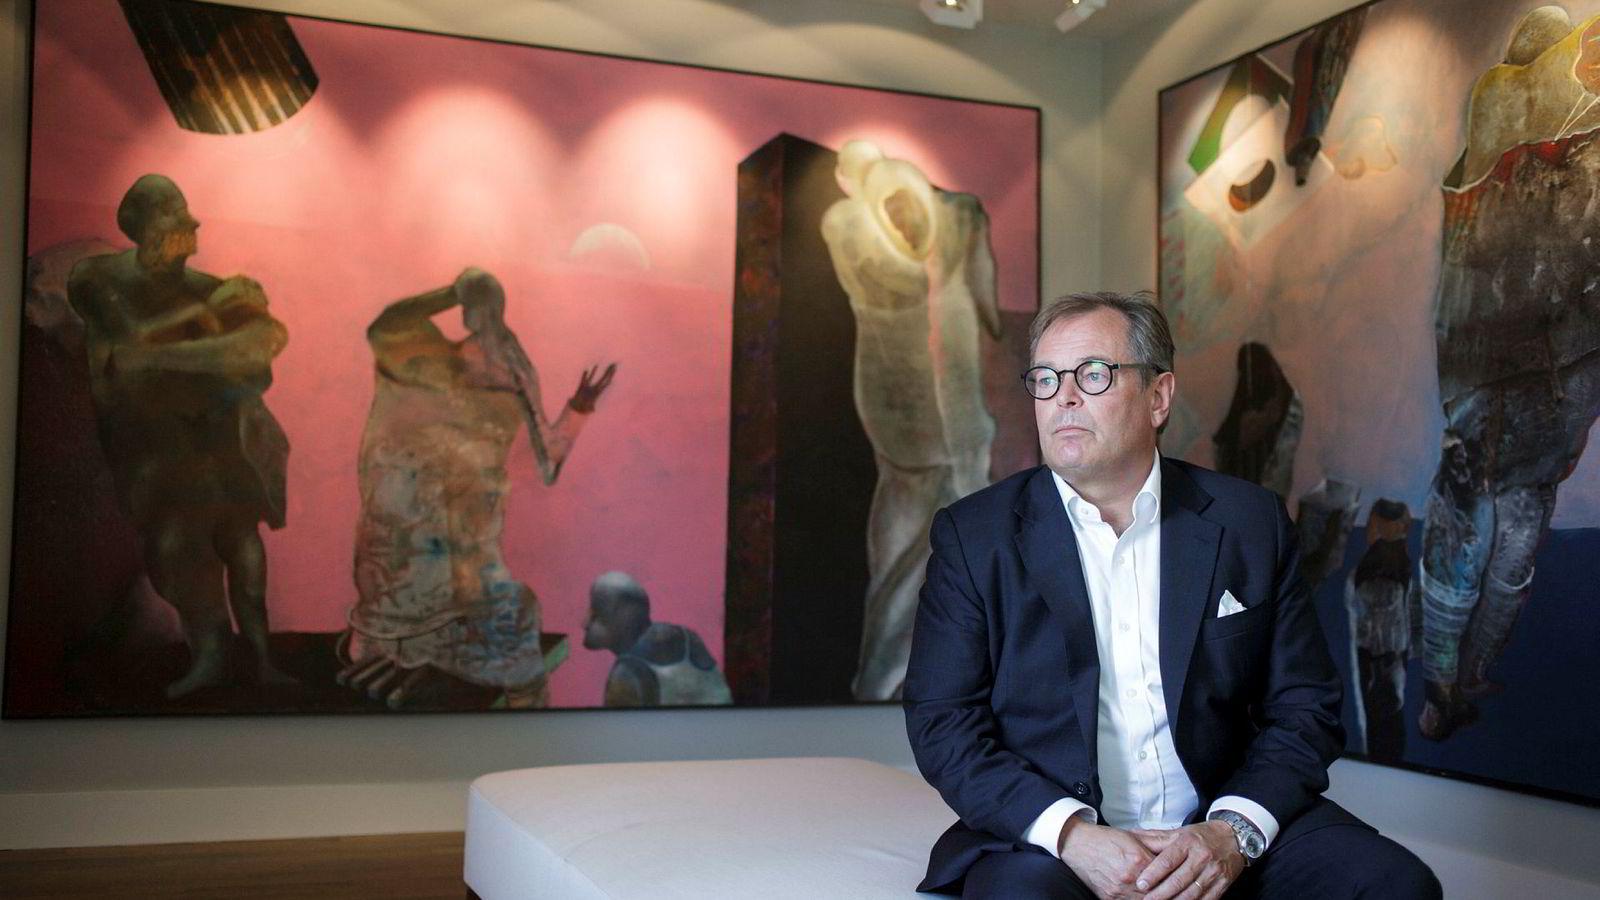 Administrerende direktør Knut Brundtland i ABG Sundal Collier sier det svake resultatet blant annet skyldes få børsnoteringer.